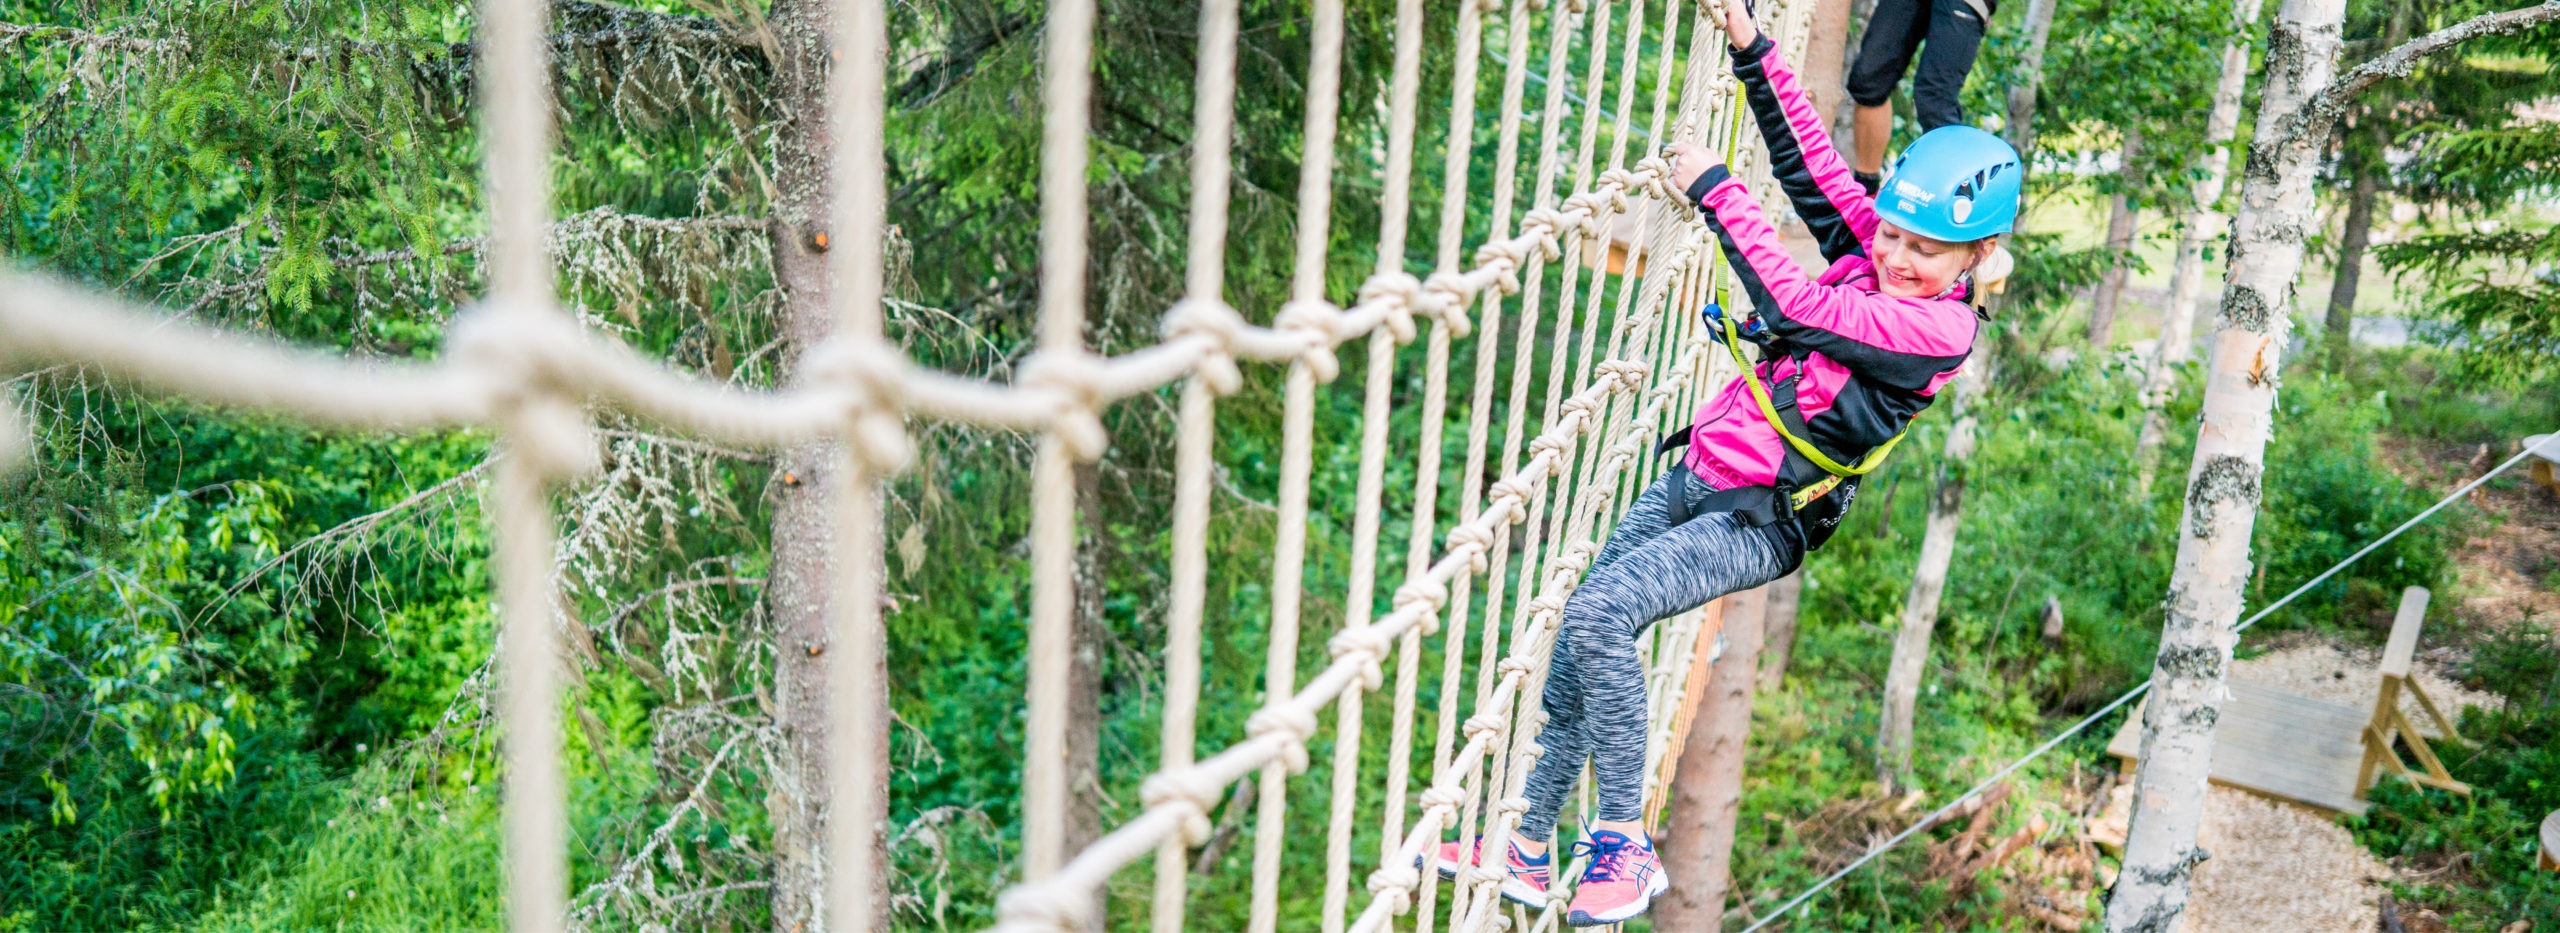 Jente i klatrepark i trysil